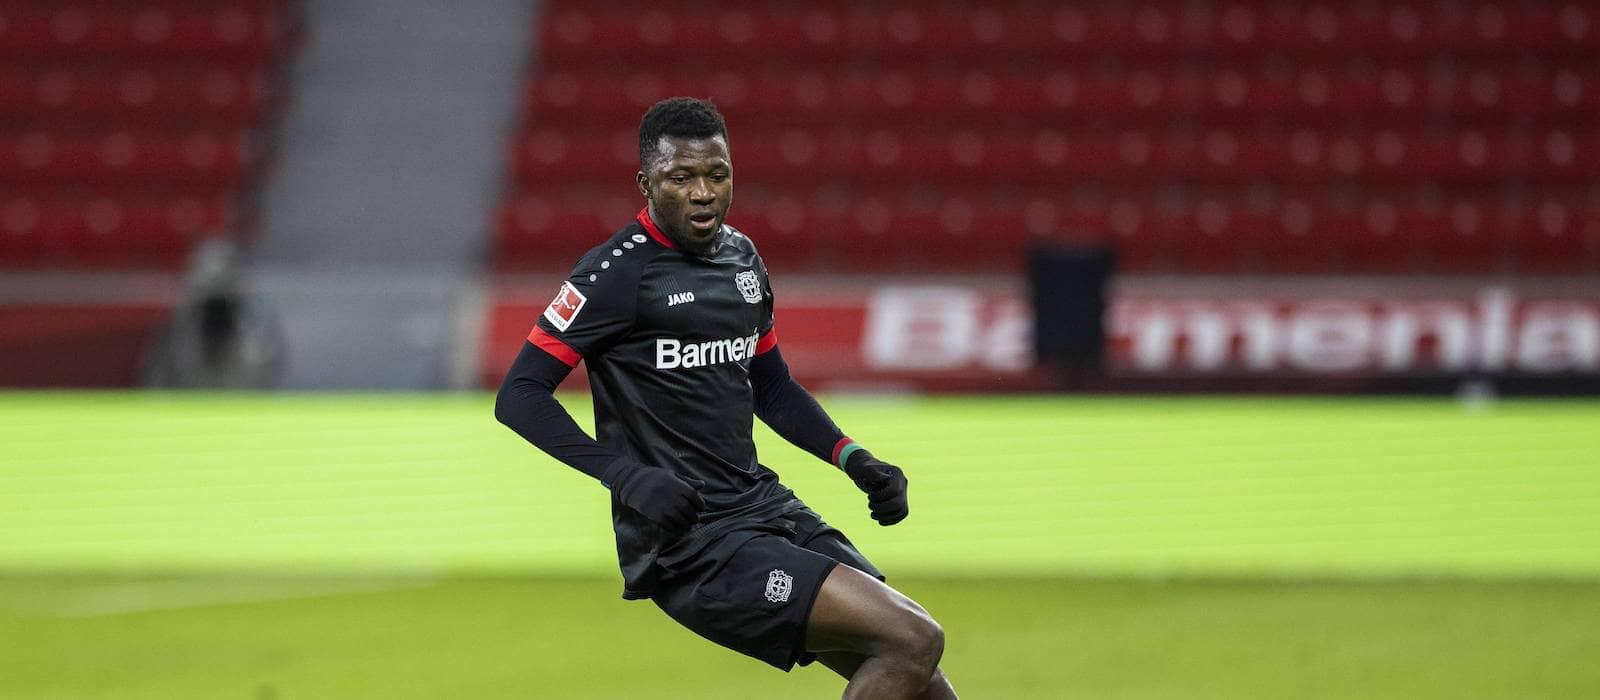 Manchester United eye up potential transfer for Edmond Tapsoba